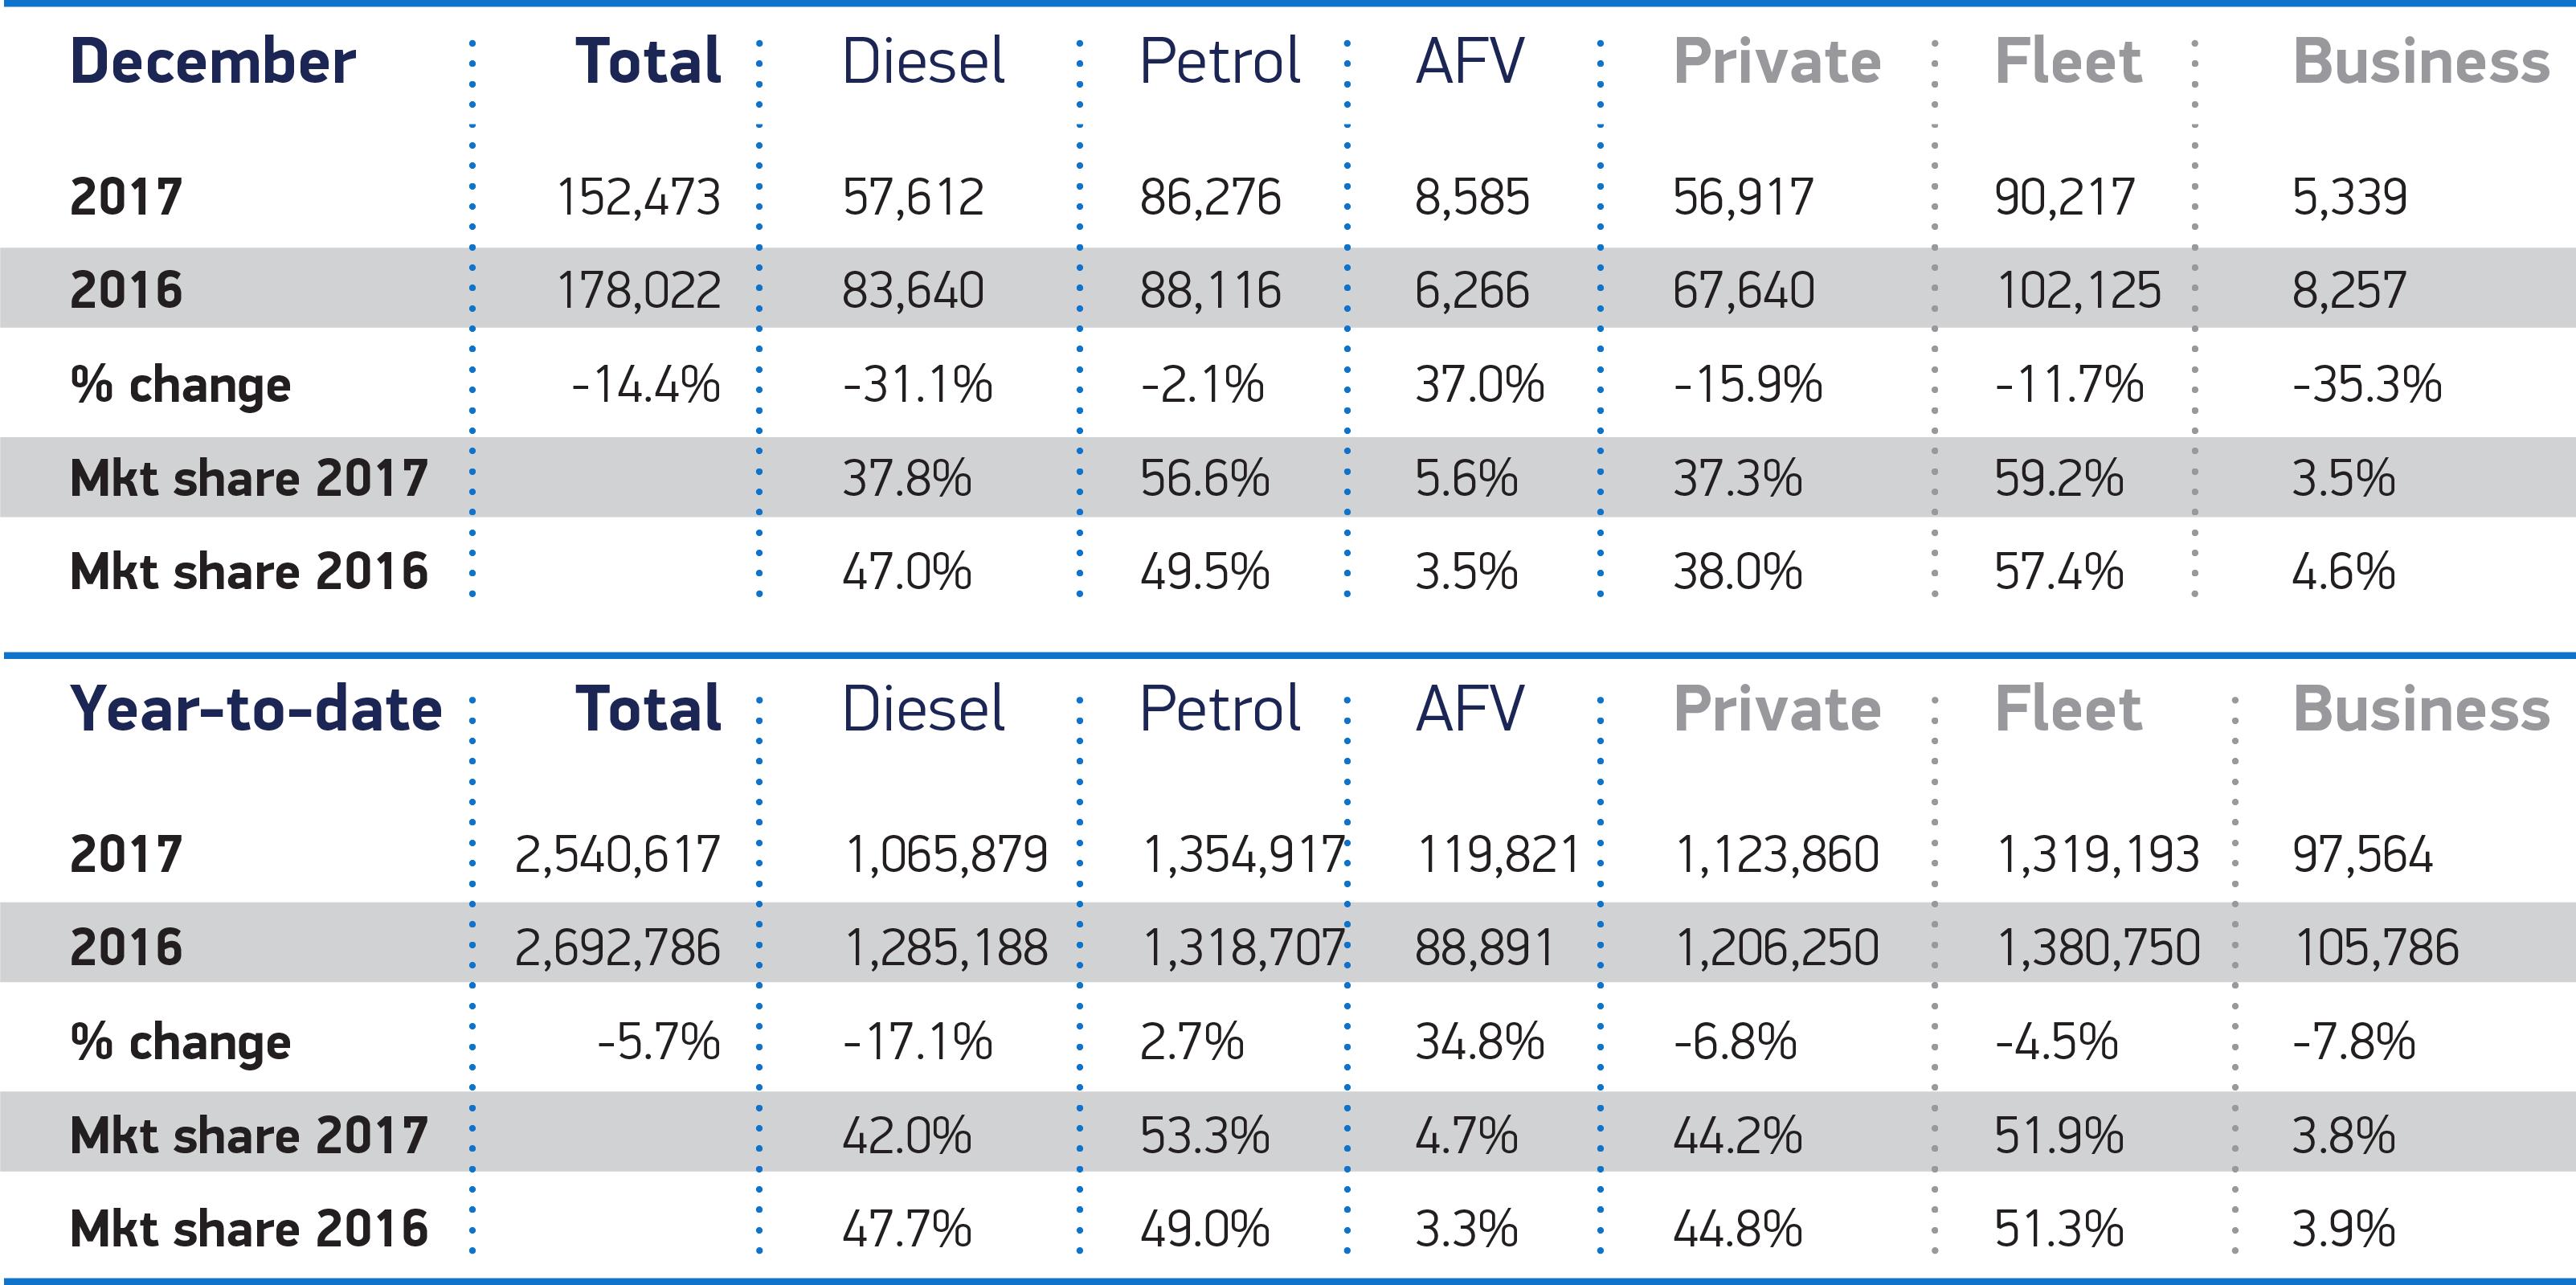 UK new car market declines in 2017 but demand still third